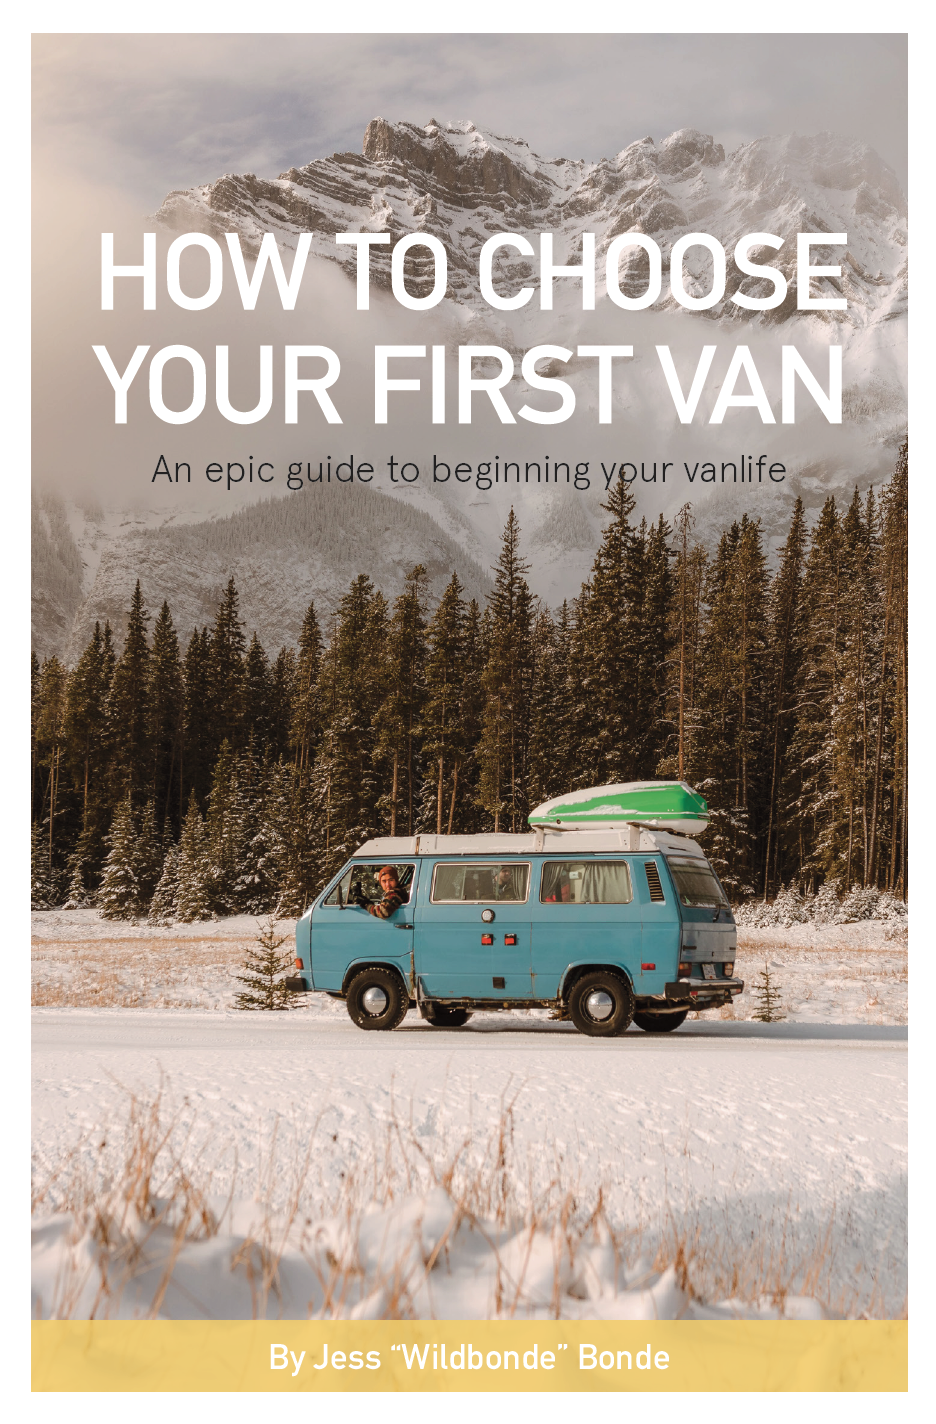 Best Van For Vanlife